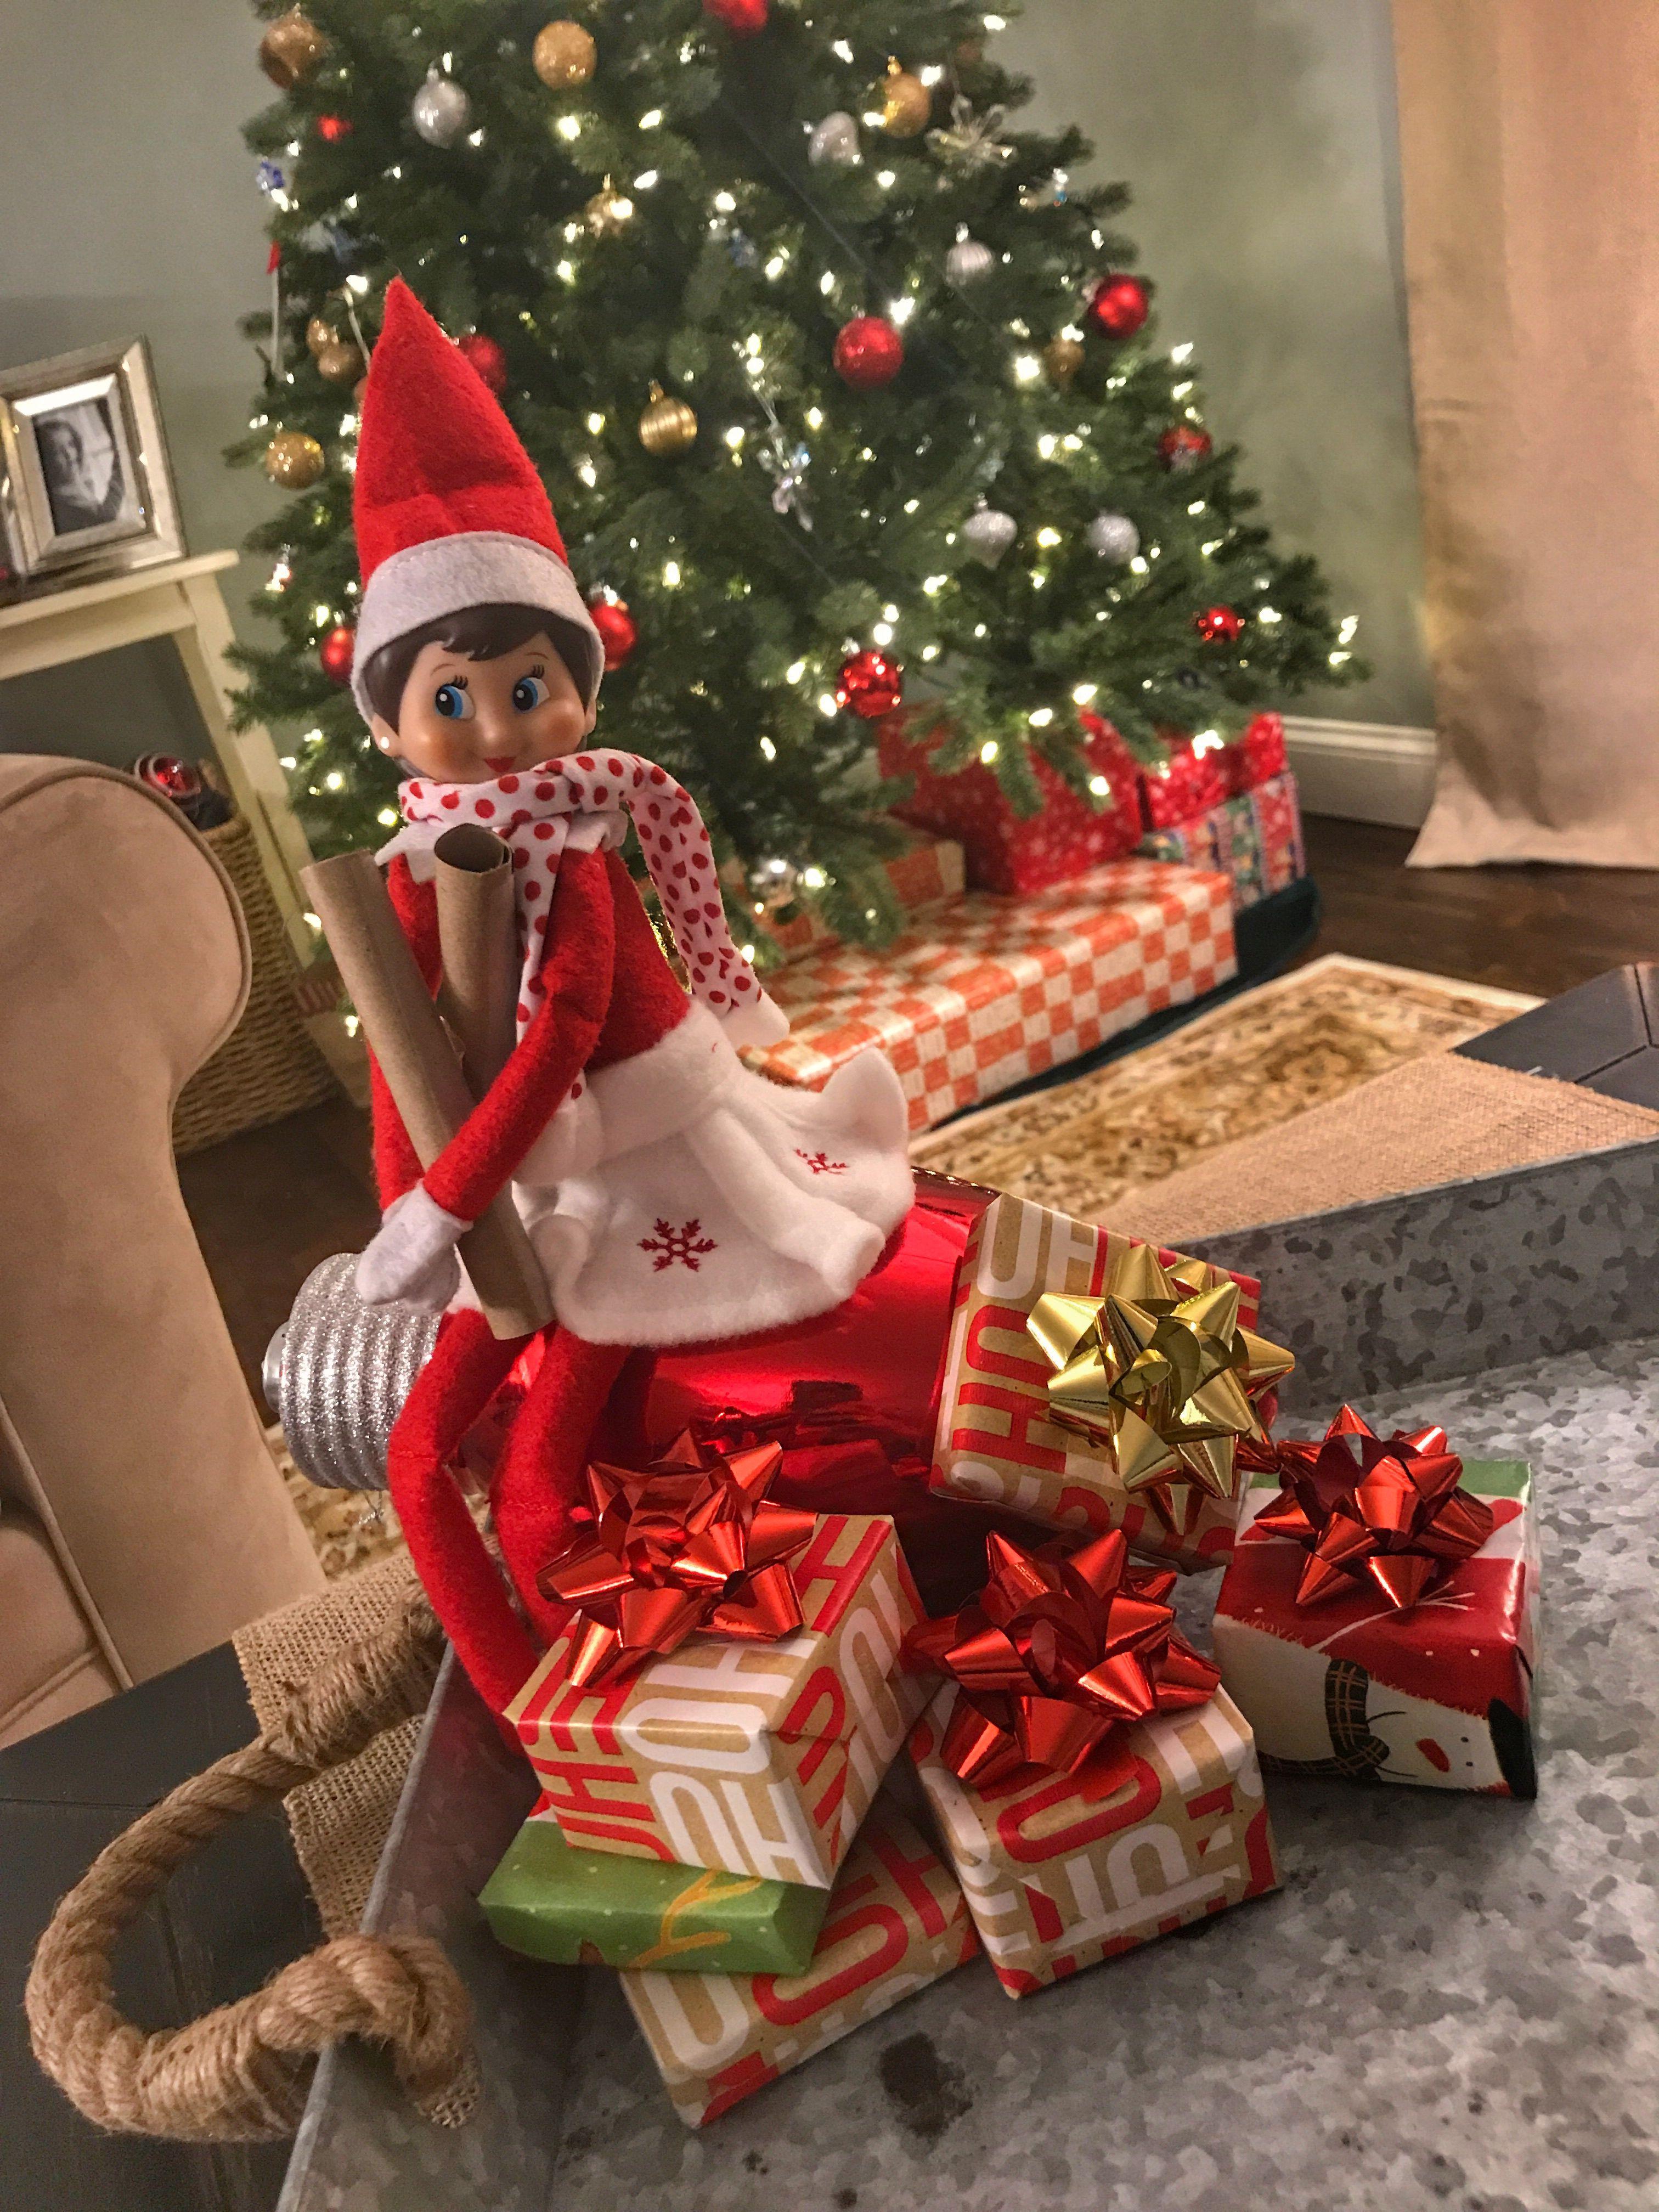 Elf On The Shelf Wrapping Presents Christmas Elf Birthday Elf